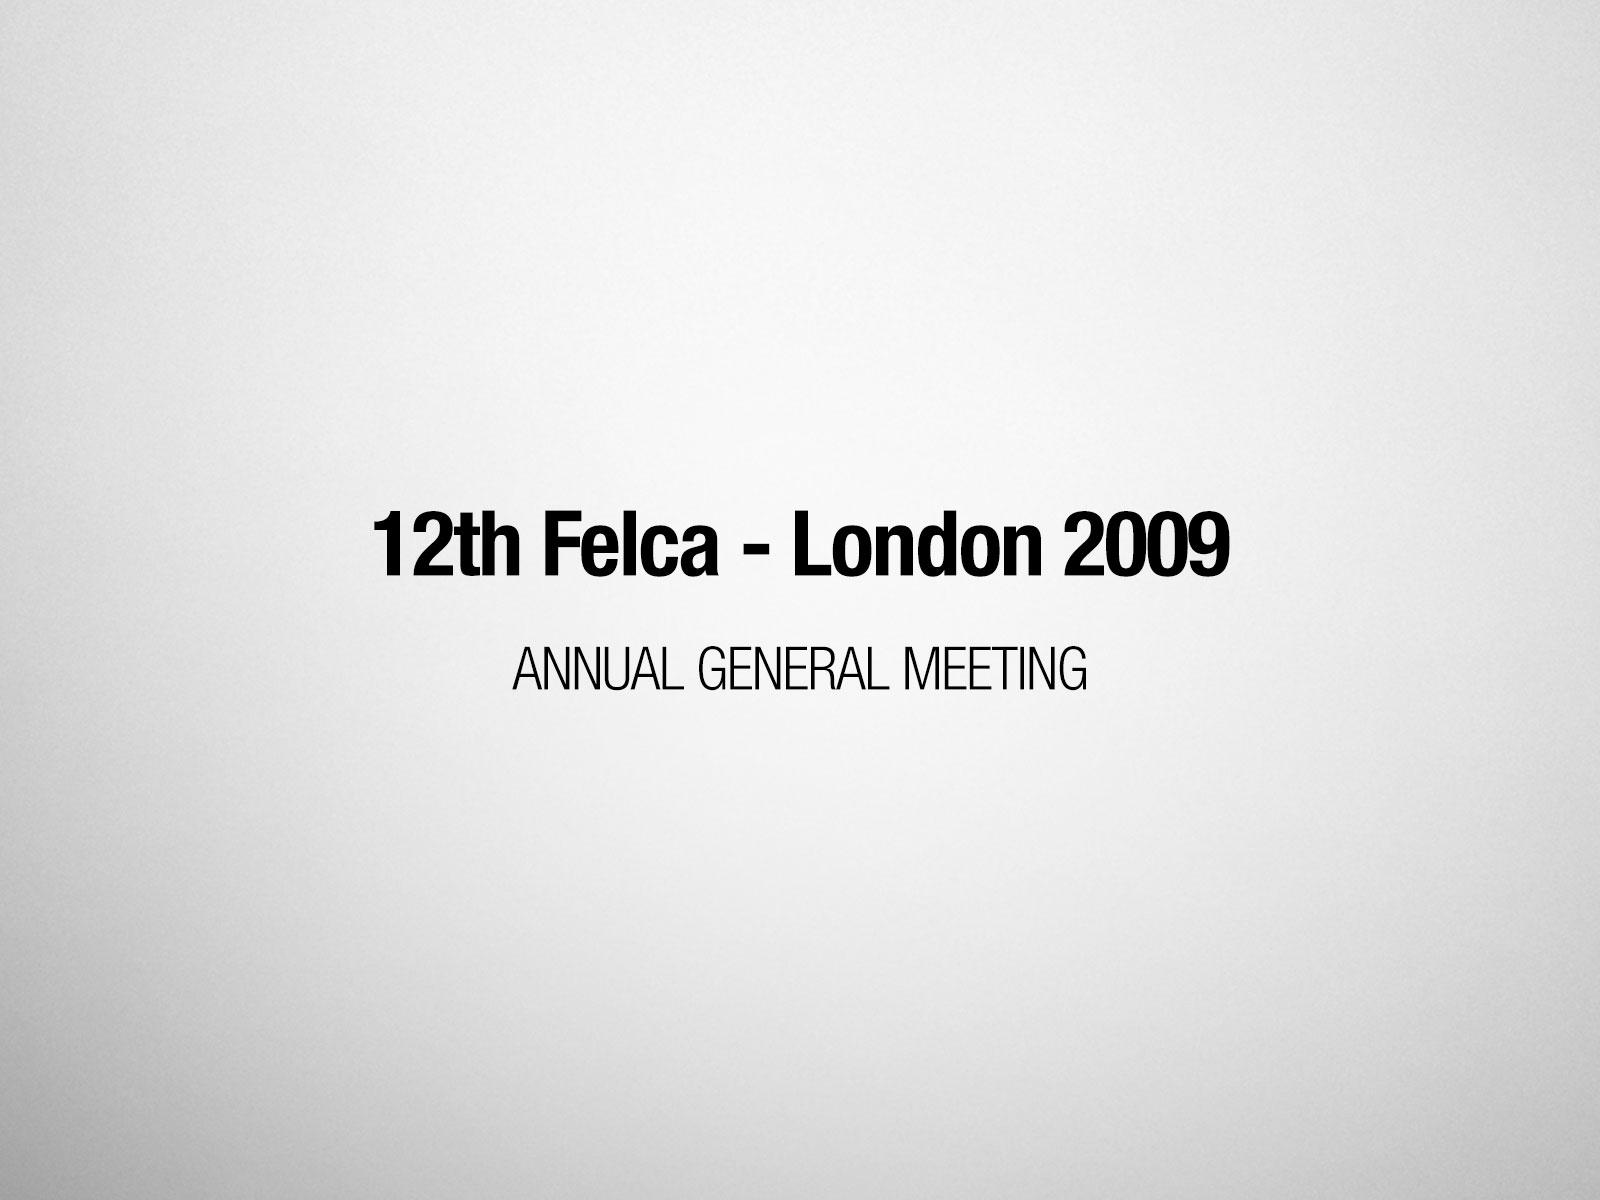 12th Felca Annual General Meeting – London 2009